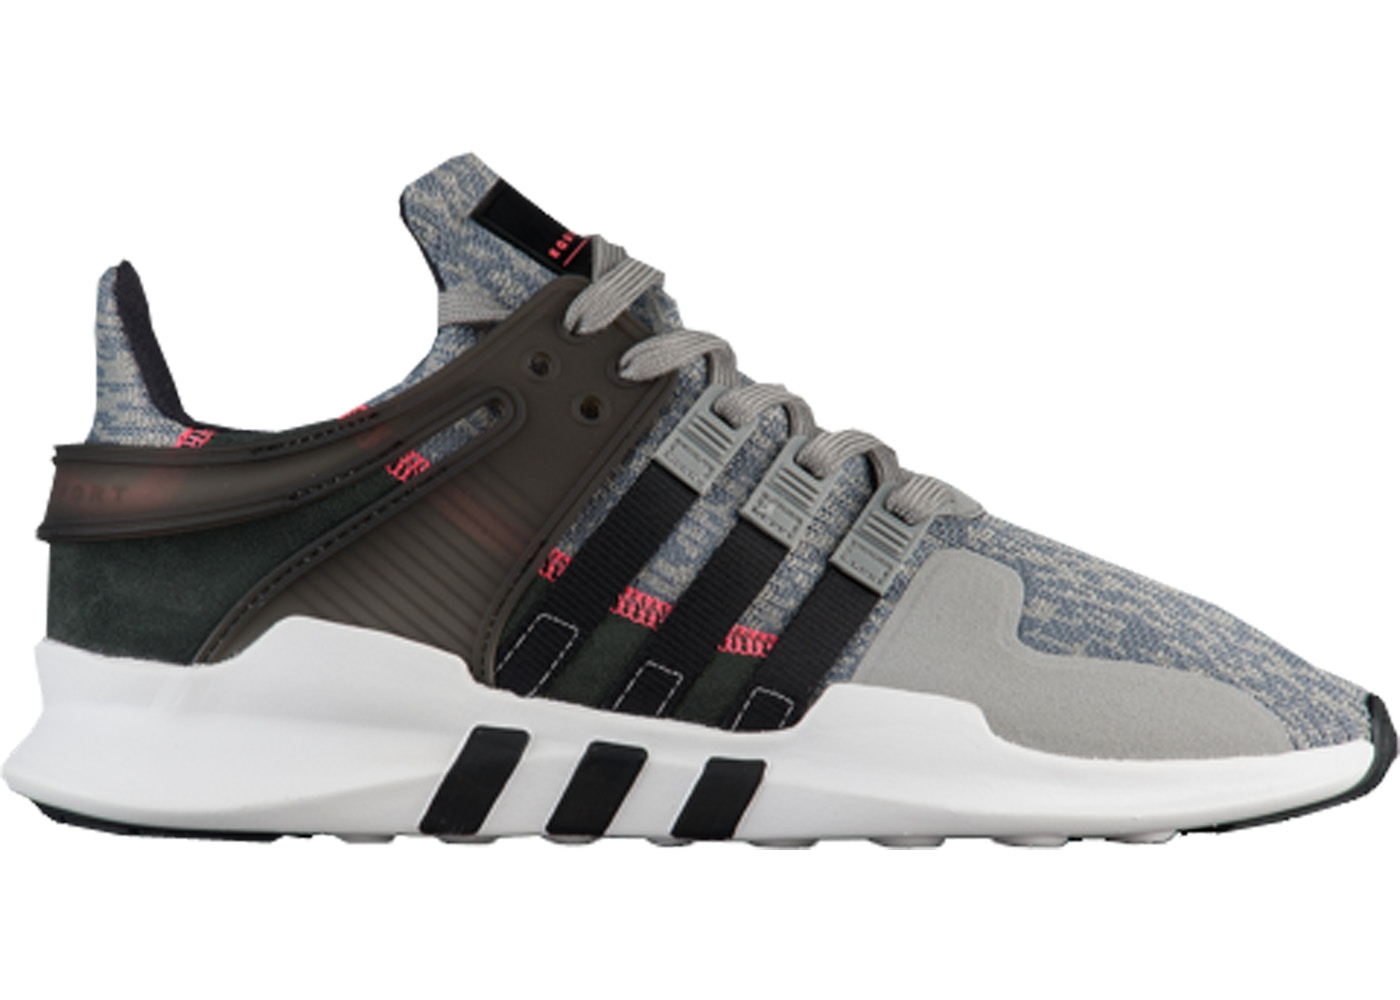 adidas EQT Support ADV Grey Black Turbo Red